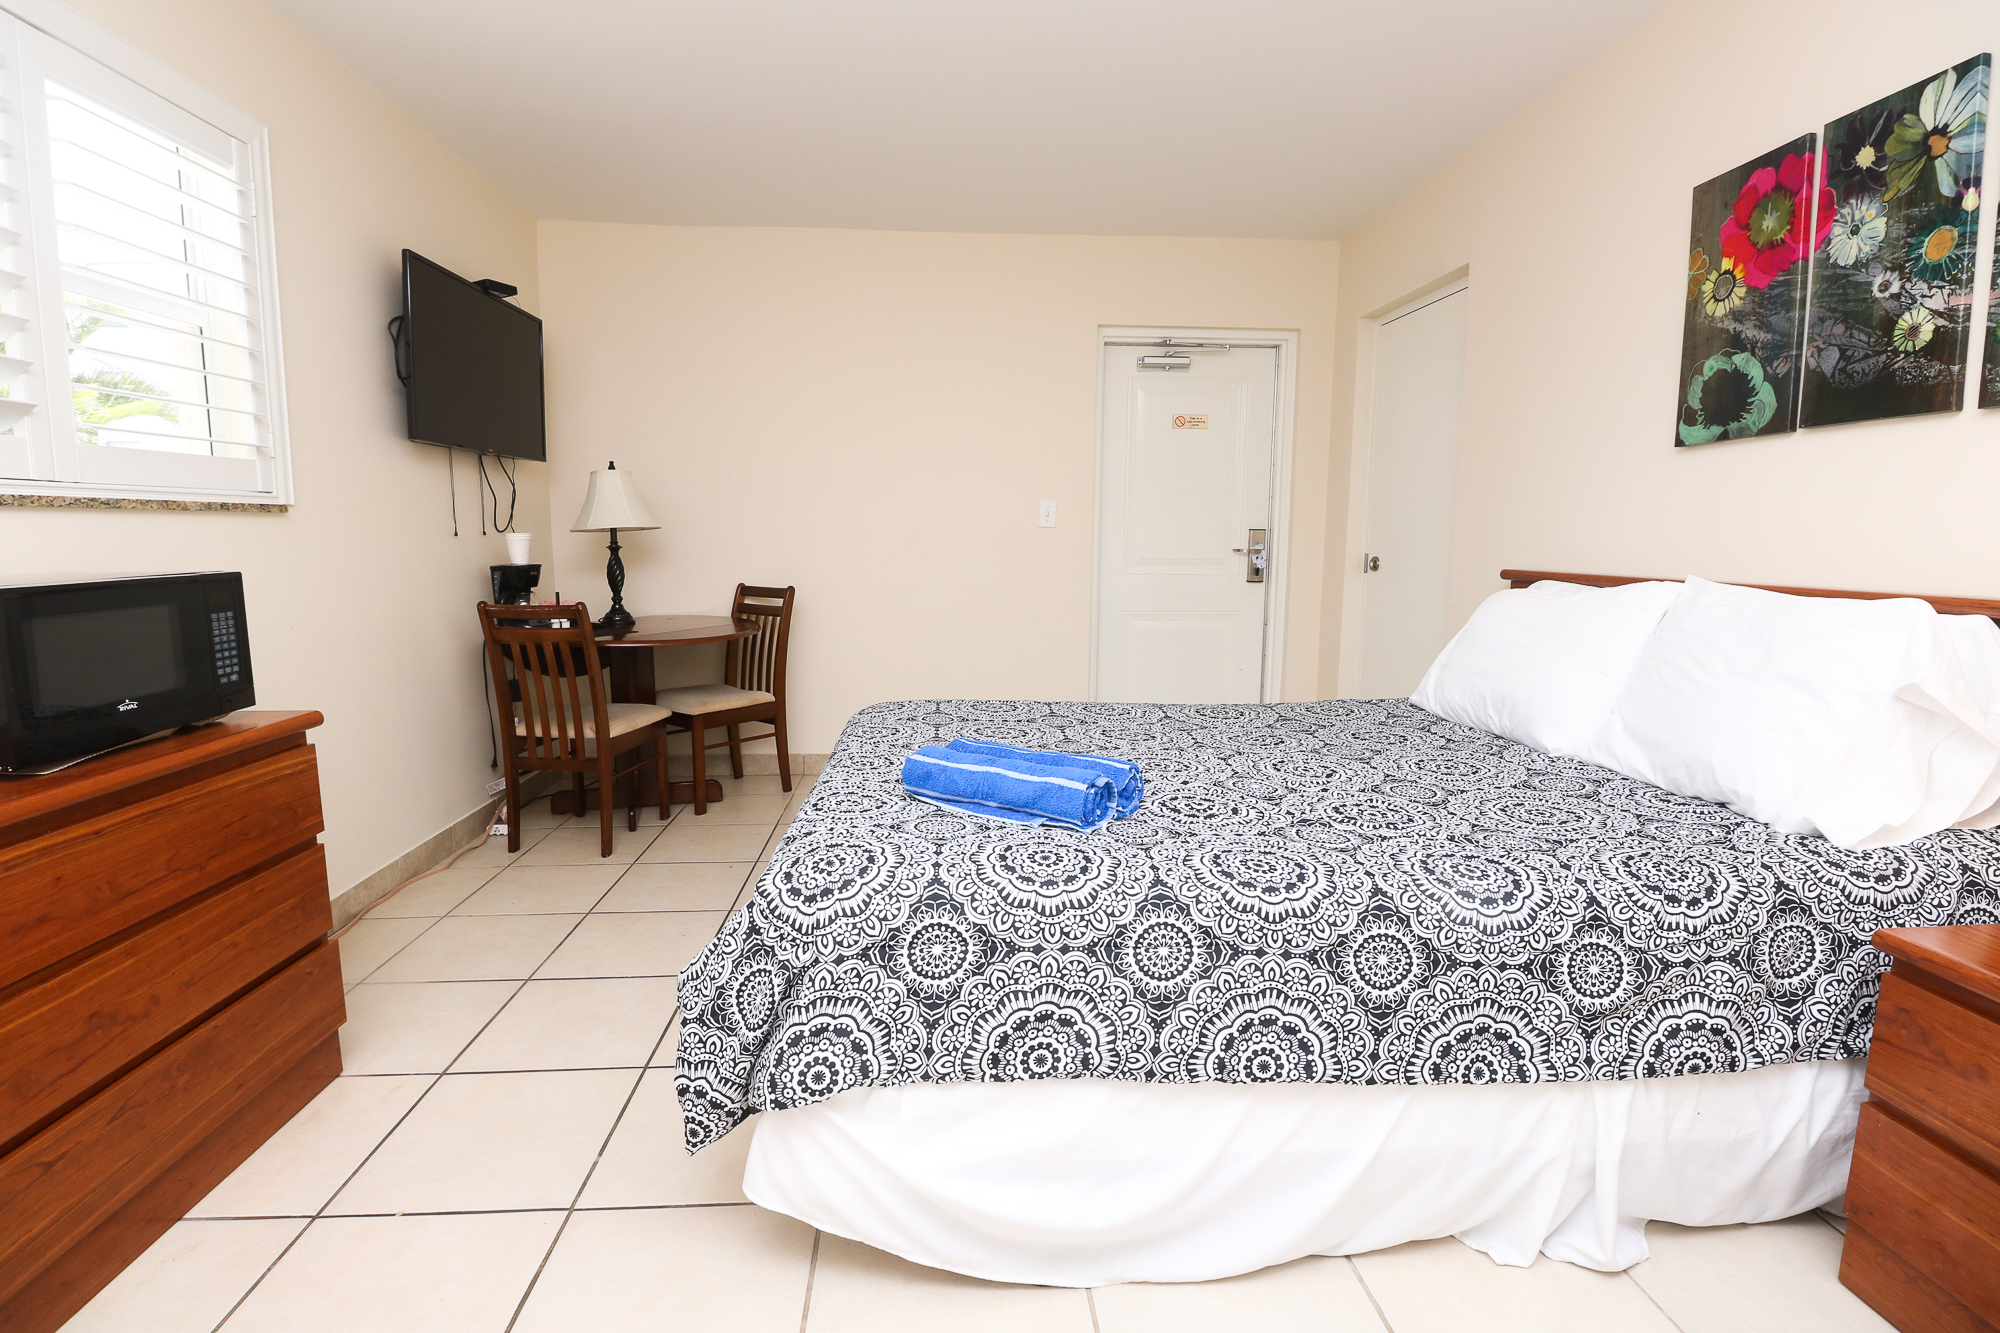 Atlantique Beach House Hotel - Single #10 photo 16147144